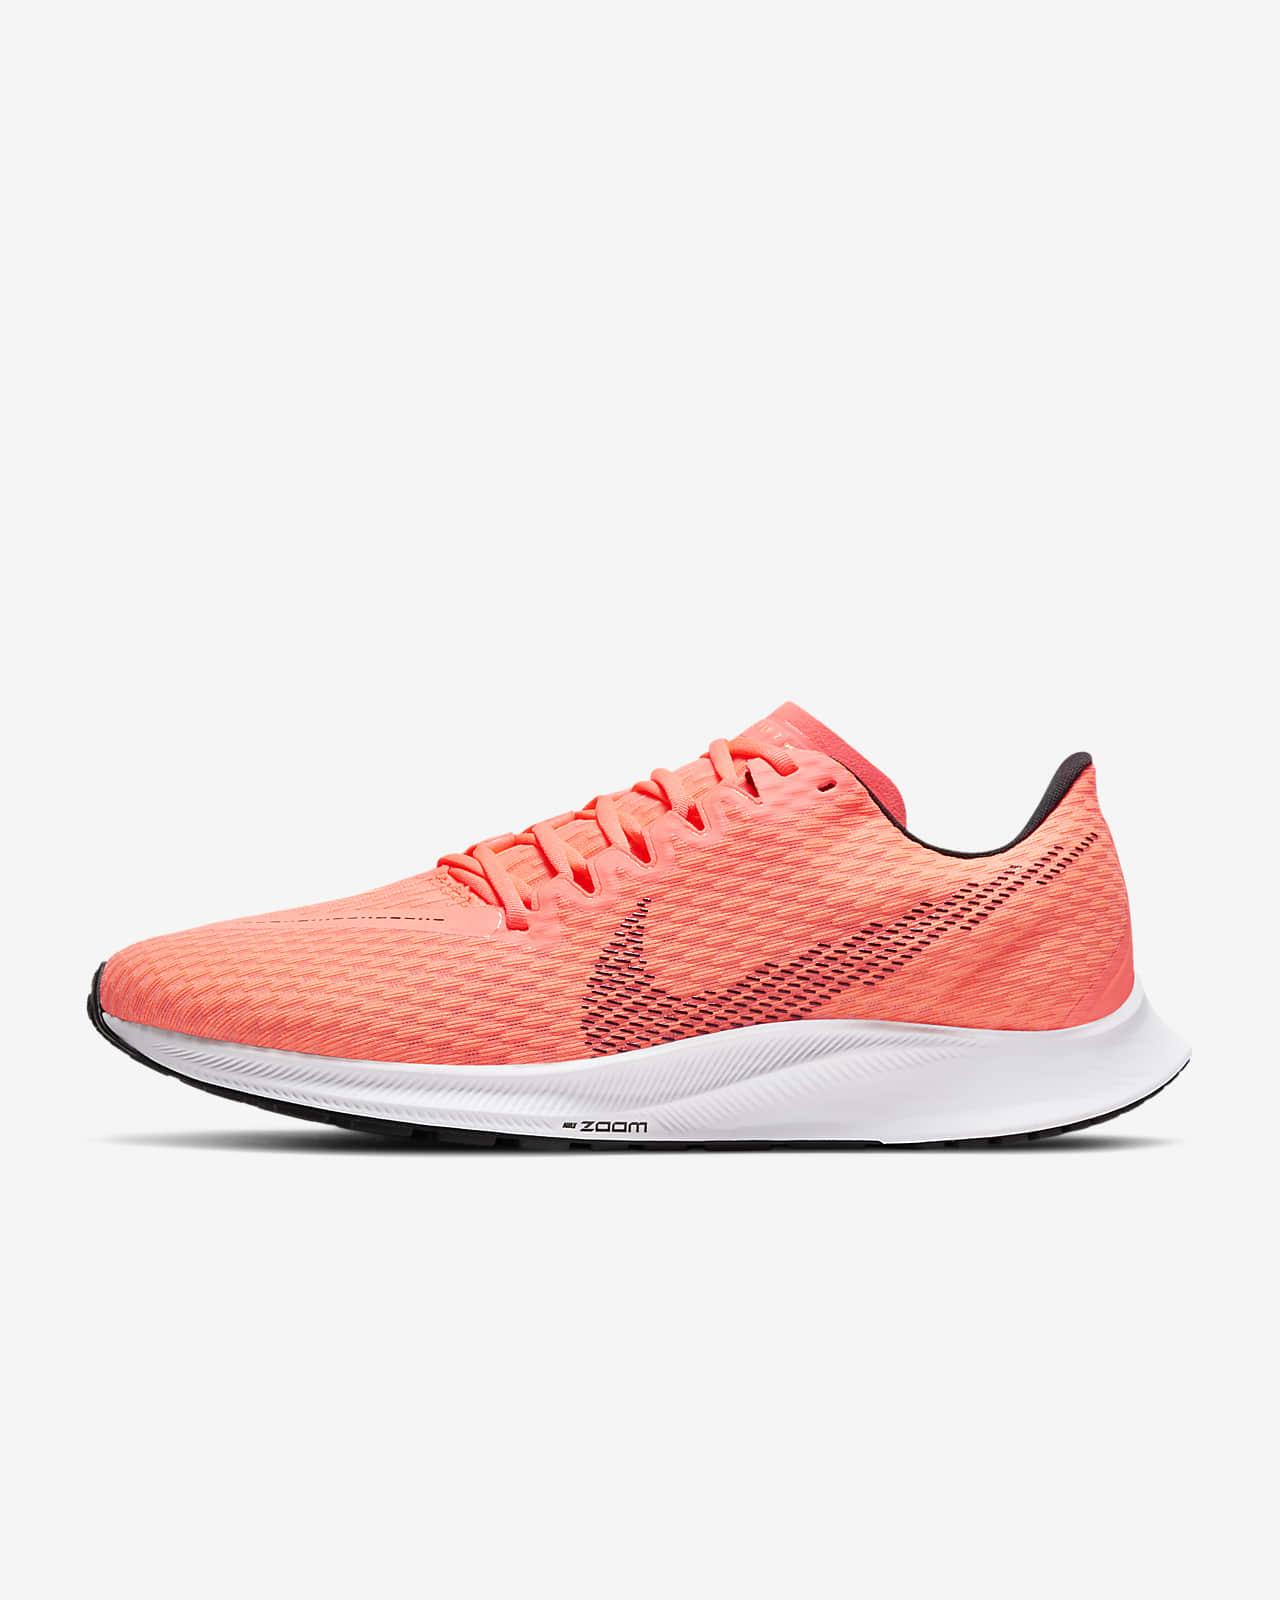 Nike Zoom Rival Fly 2 Men's Running Shoe